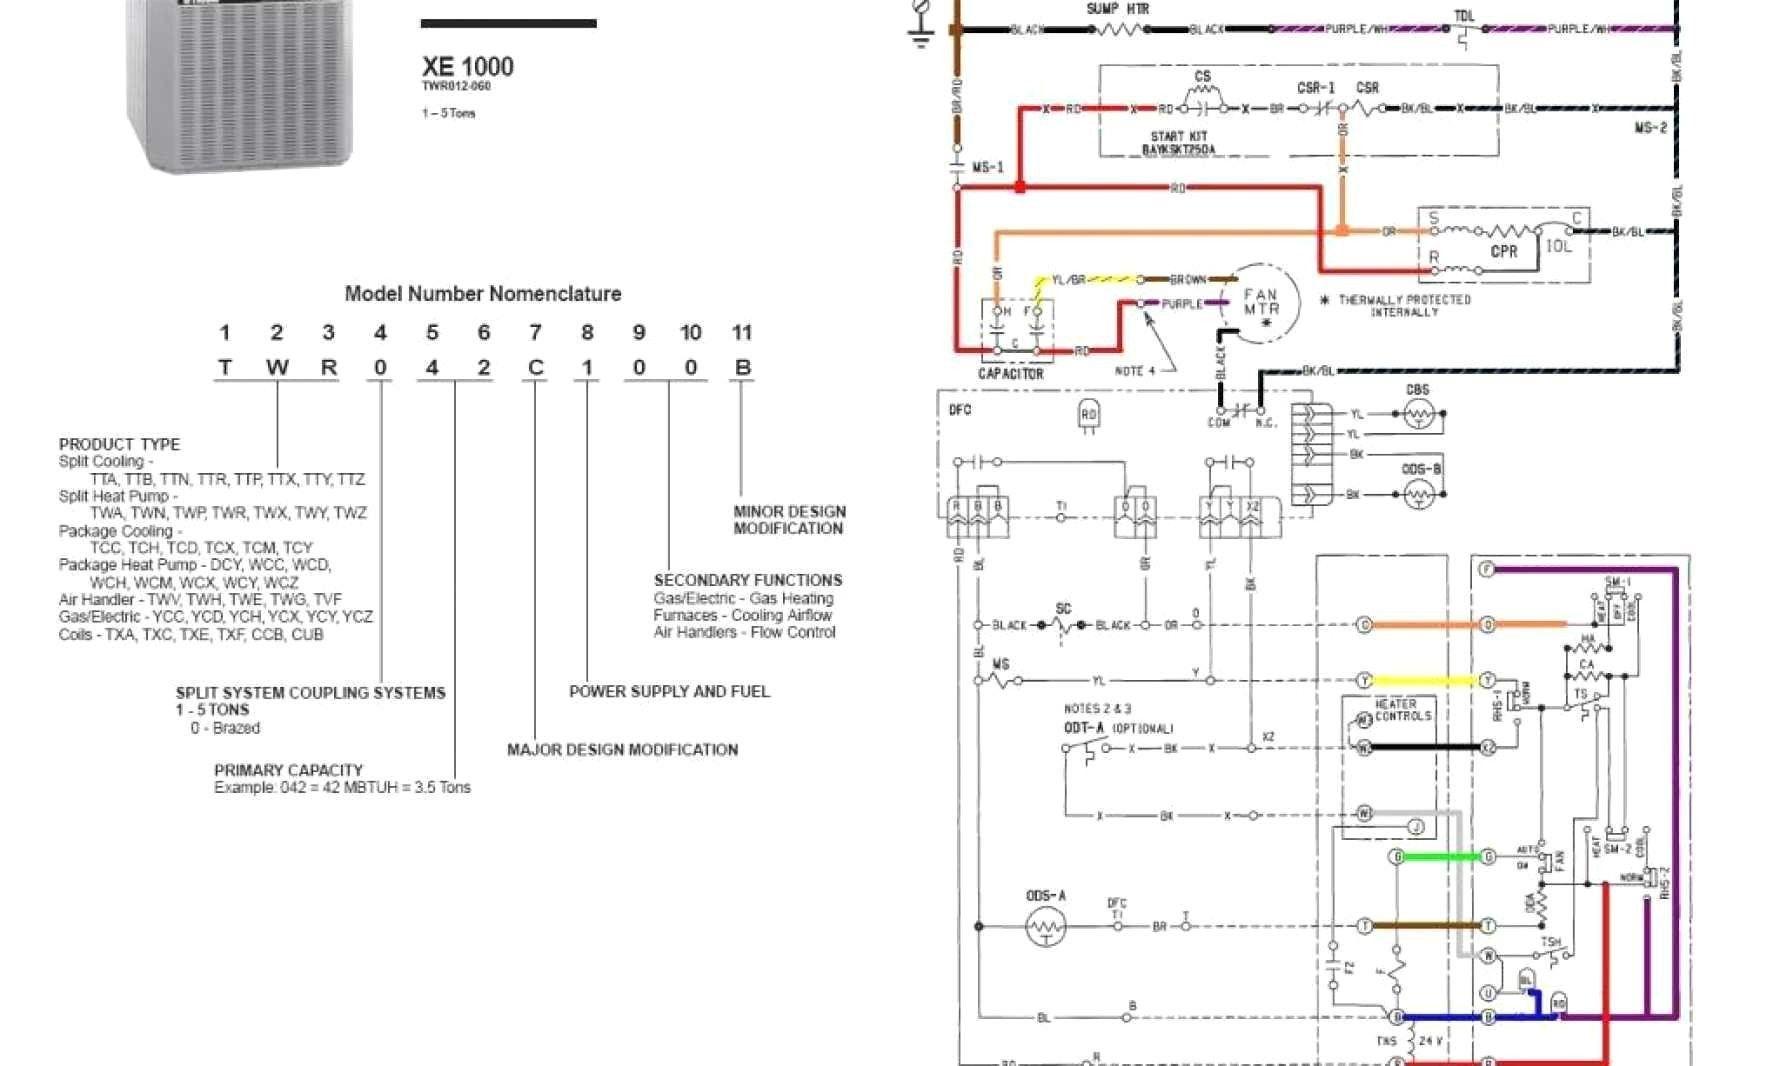 Trane Thermostat Wiring Diagram Luxury Wiring Diagram For